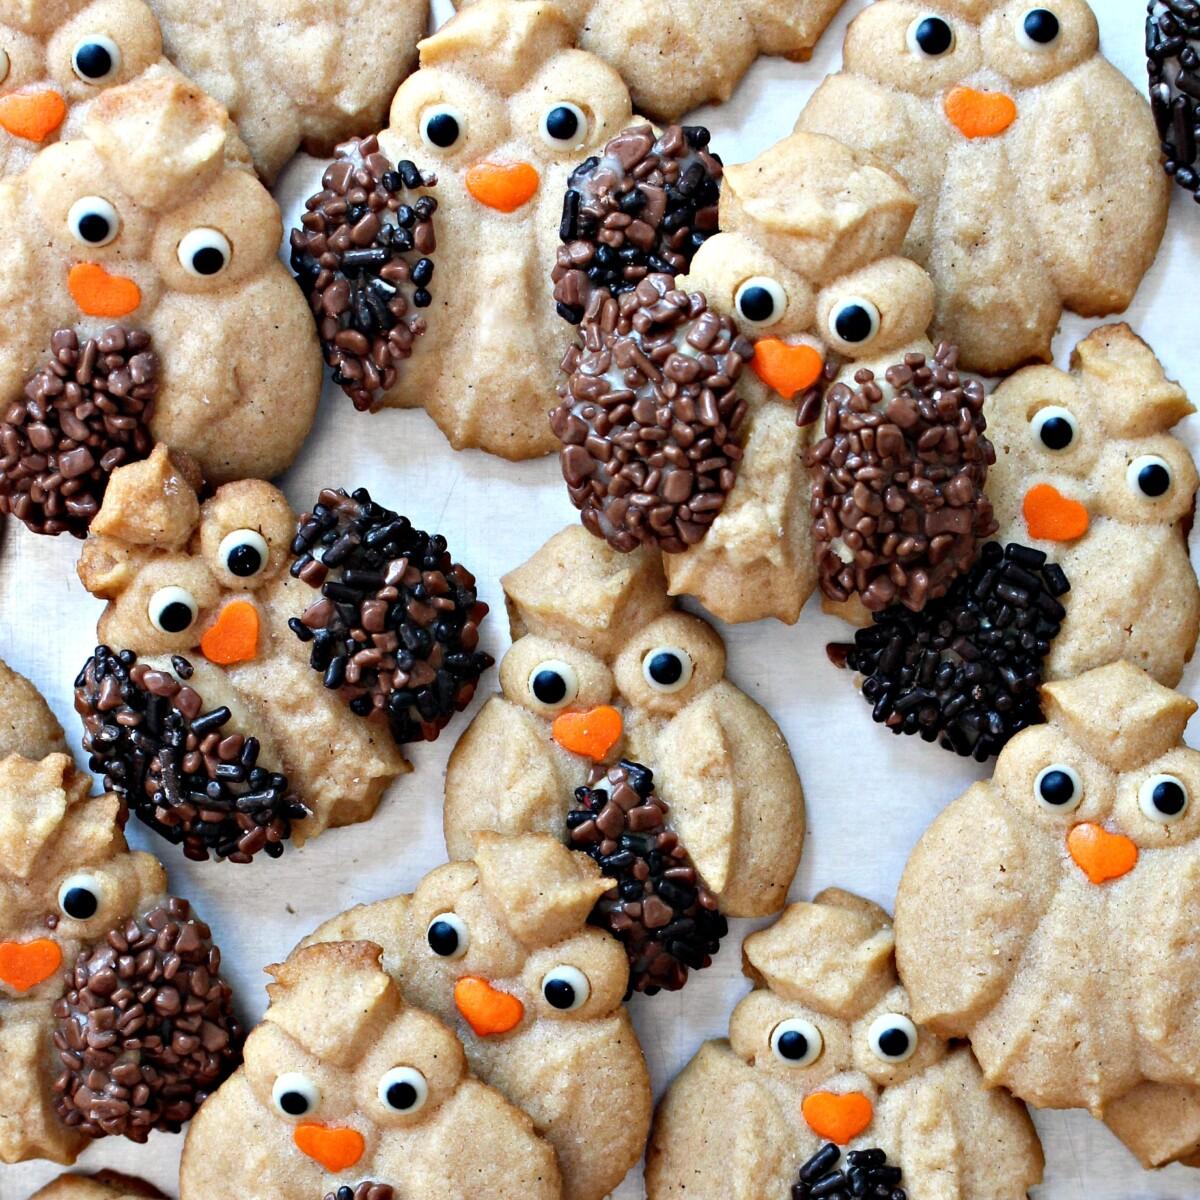 Closeup of sprinkle decorated Cinnamon Spritz Owl Cookies.